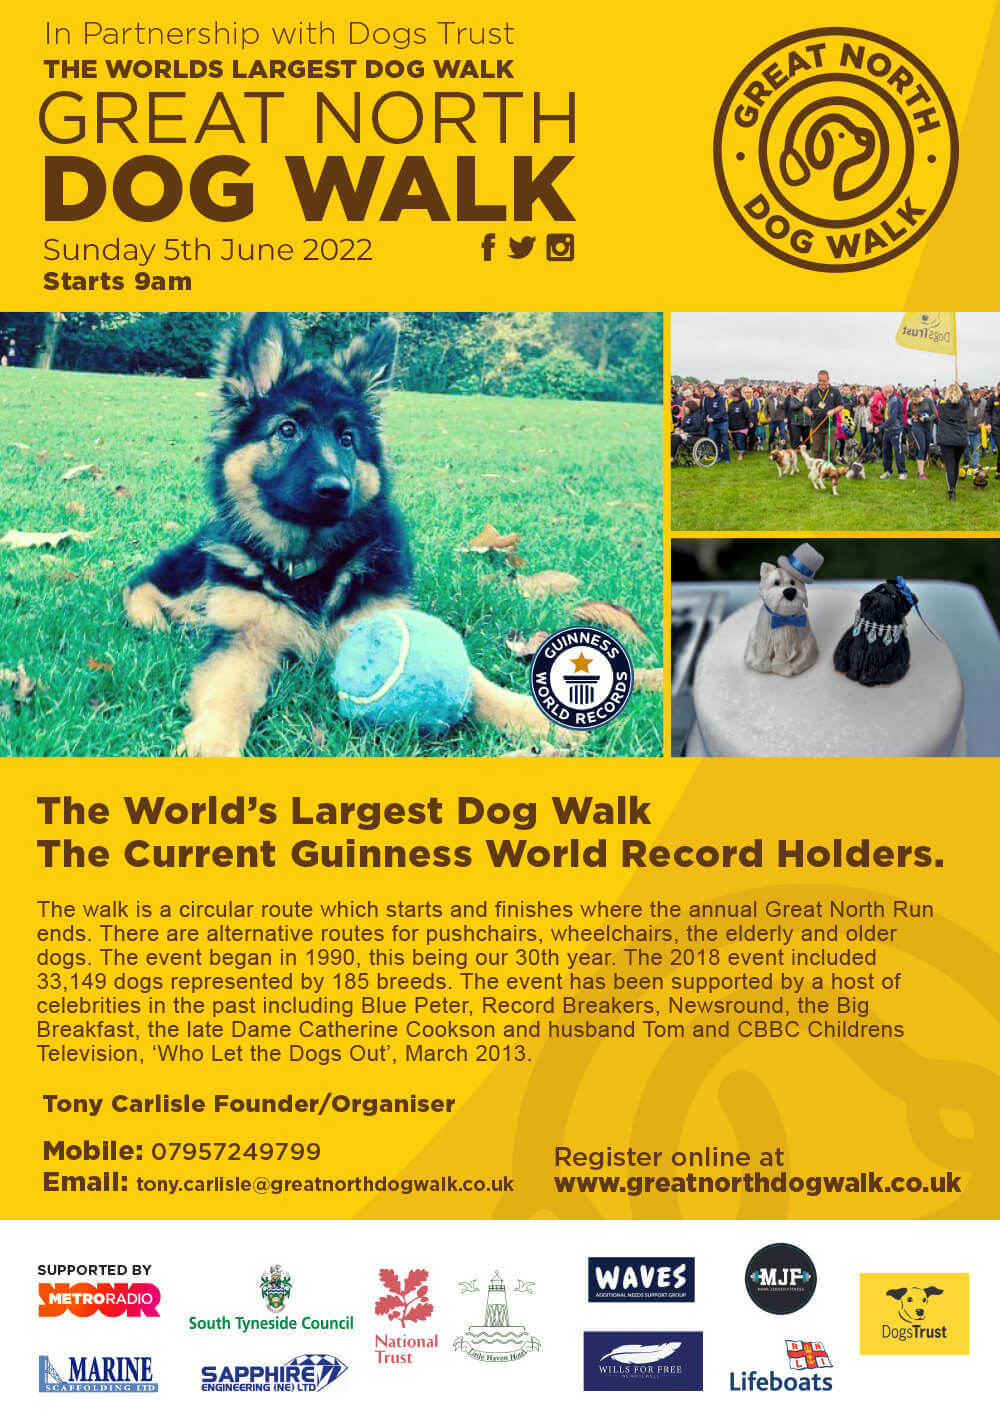 Great north dog walk poster